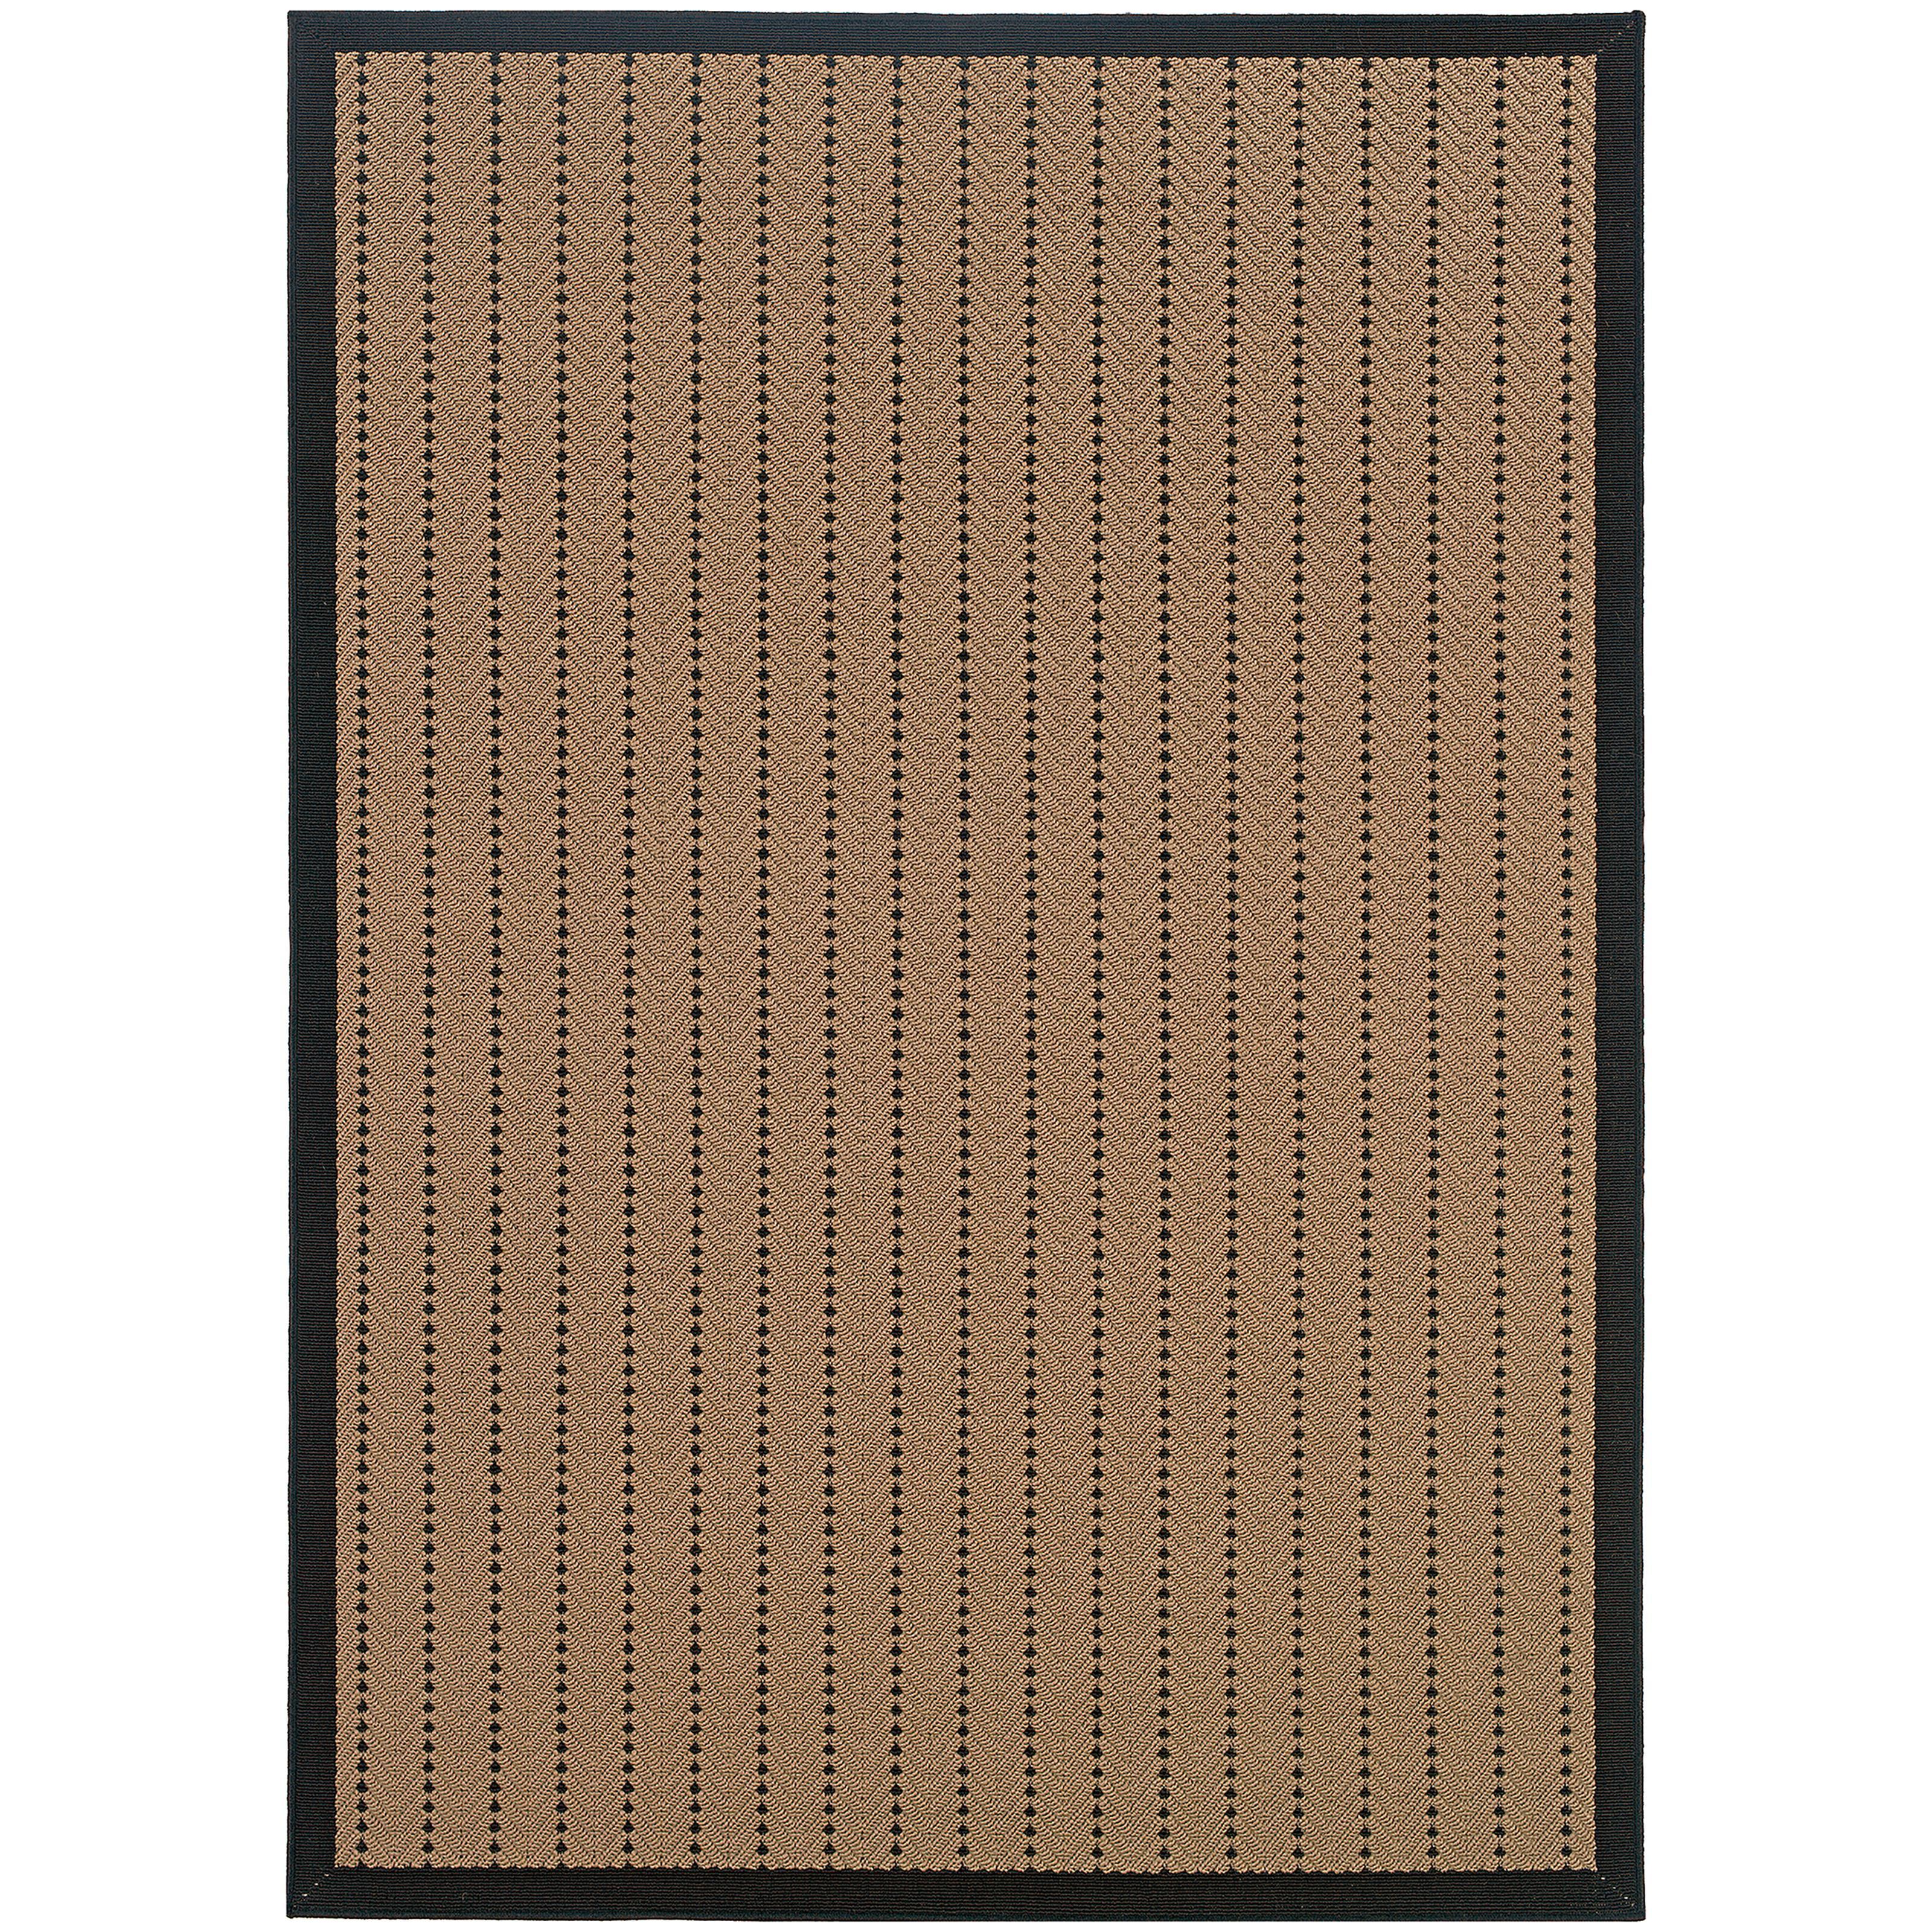 "Lanai 5' 3"" X  7' 6"" Rug by Oriental Weavers at Novello Home Furnishings"